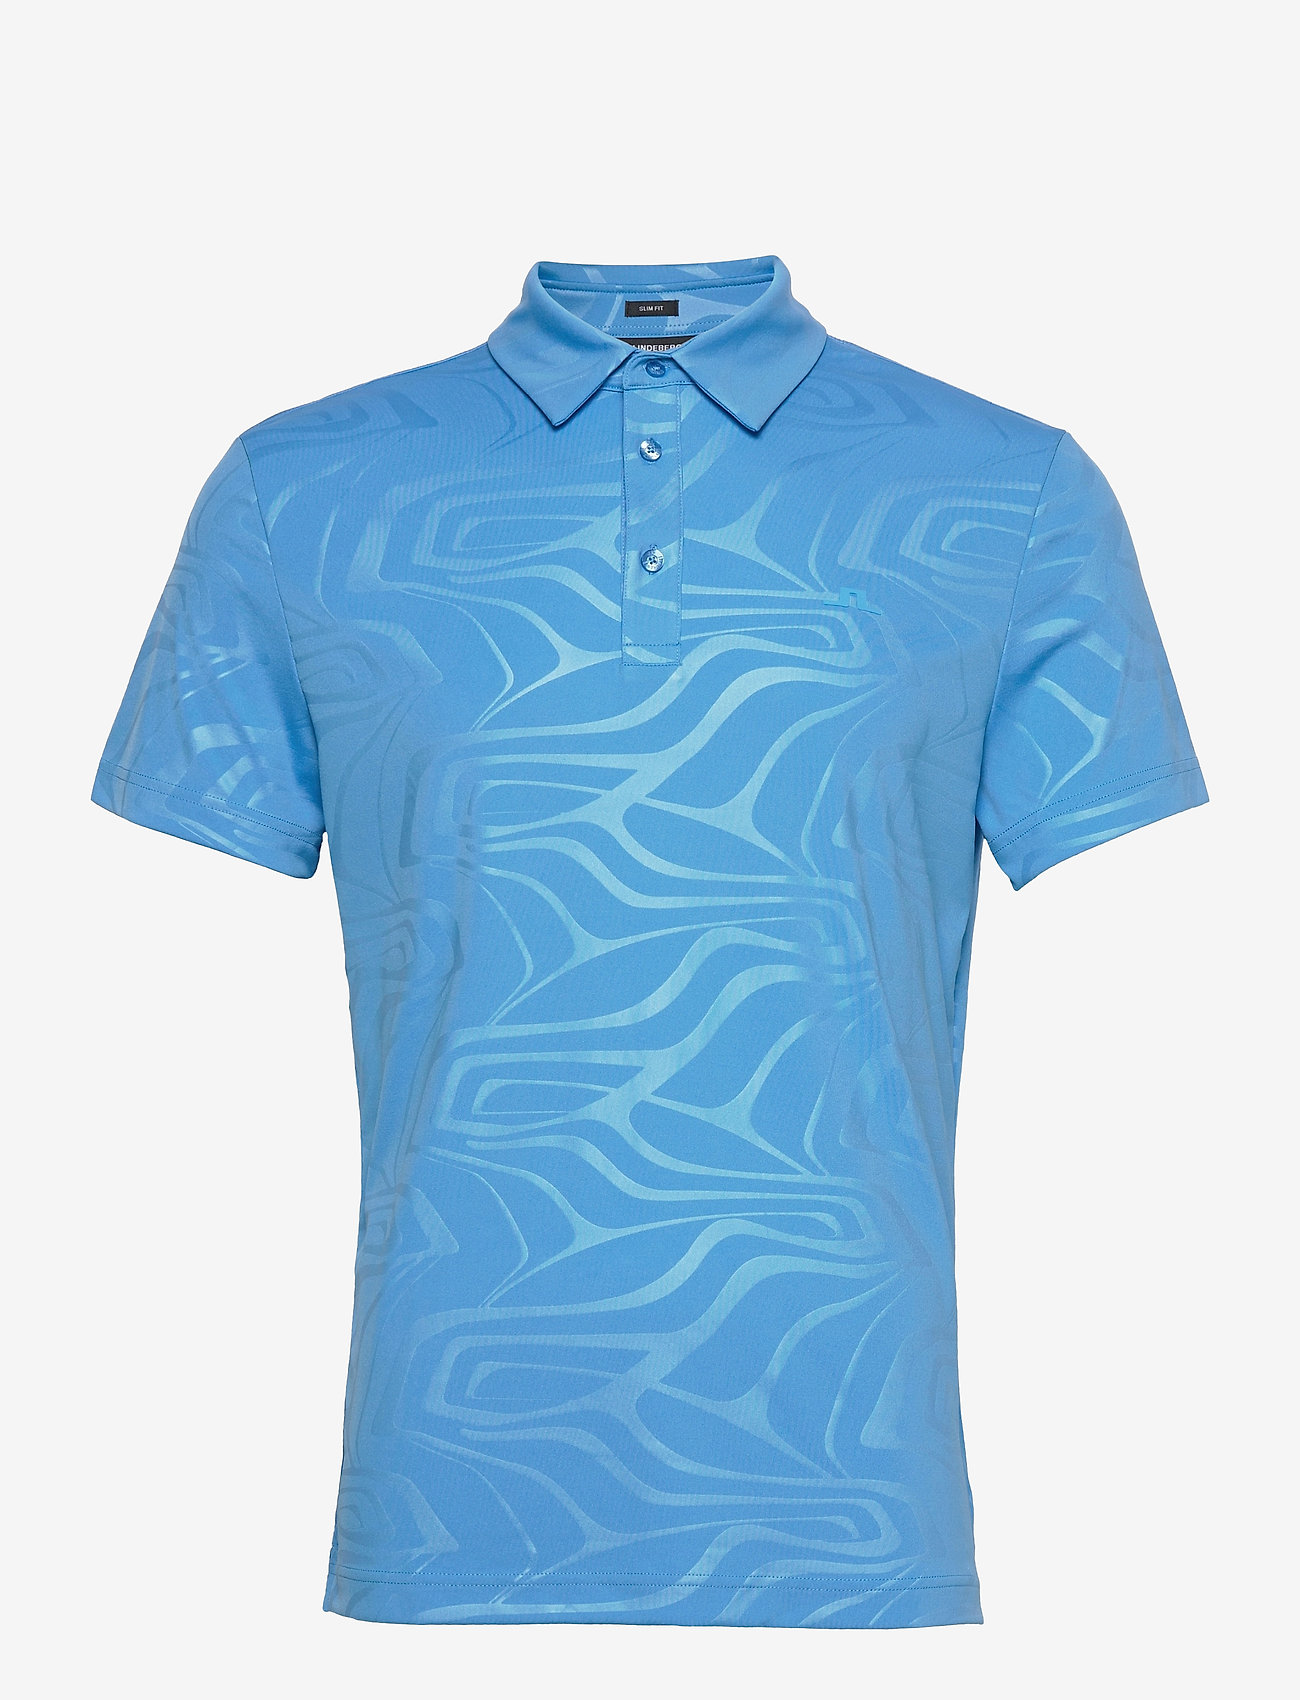 J. Lindeberg Golf - Tony Slim Fit Golf Polo Print - kurzärmelig - neo deboss ocean blue - 1